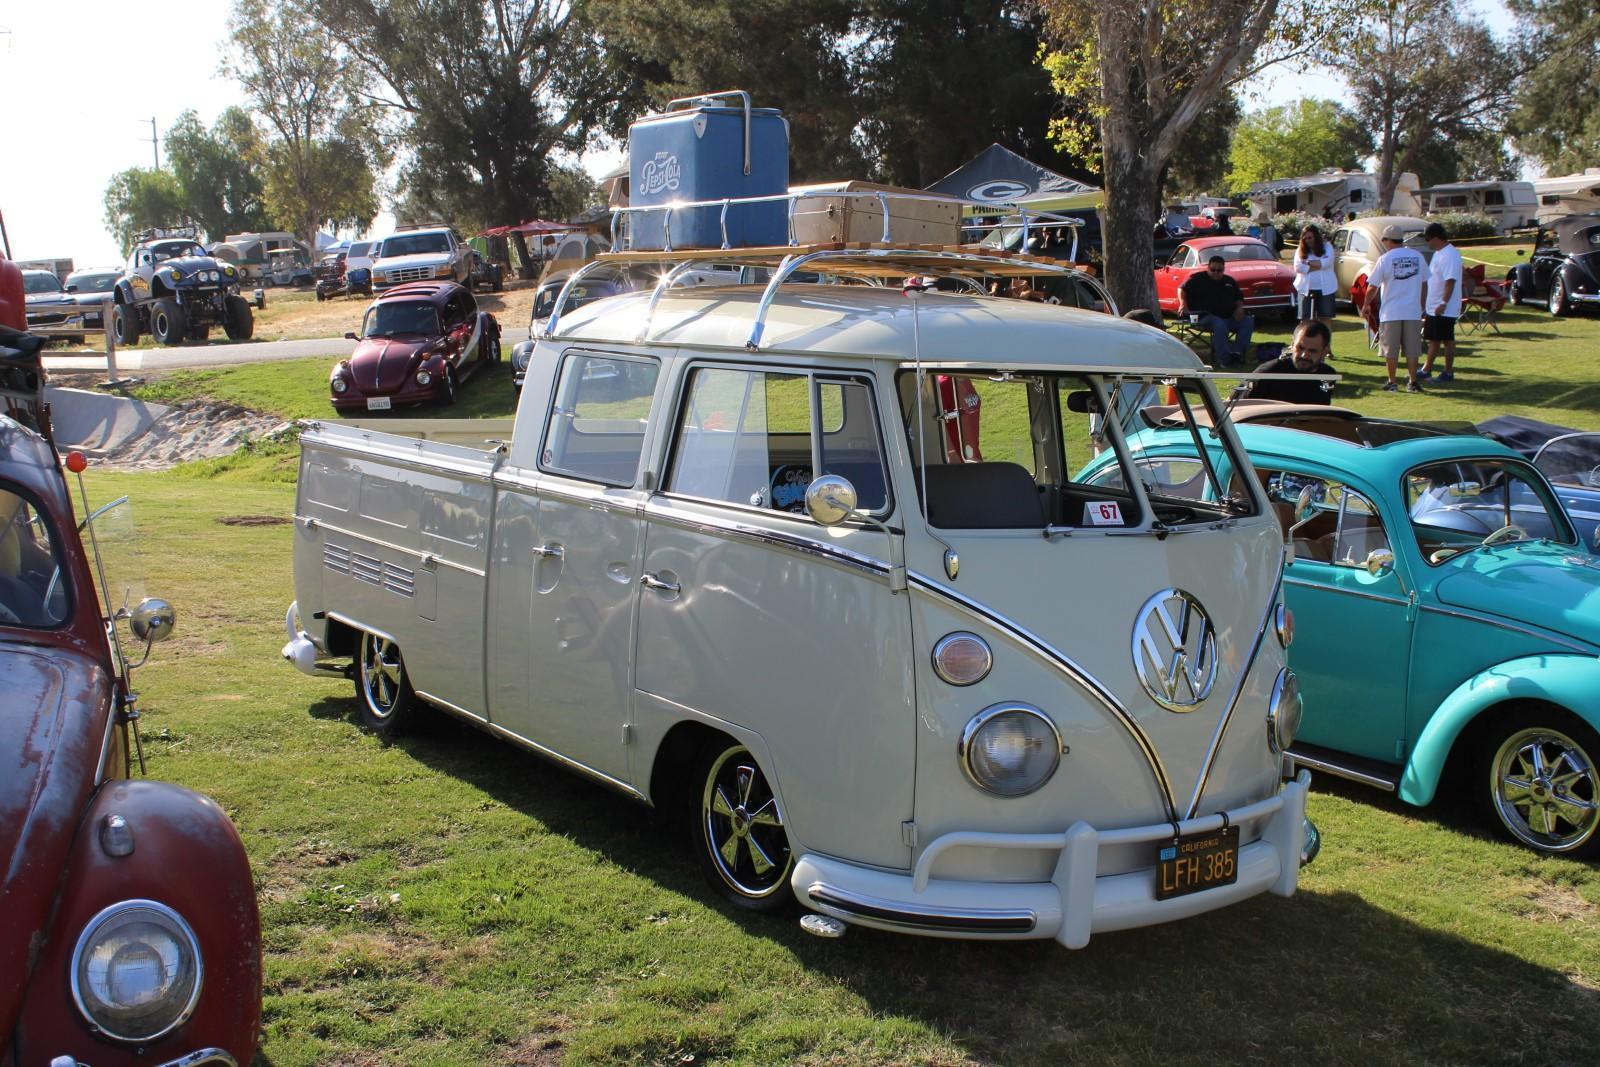 1967 Double Cab